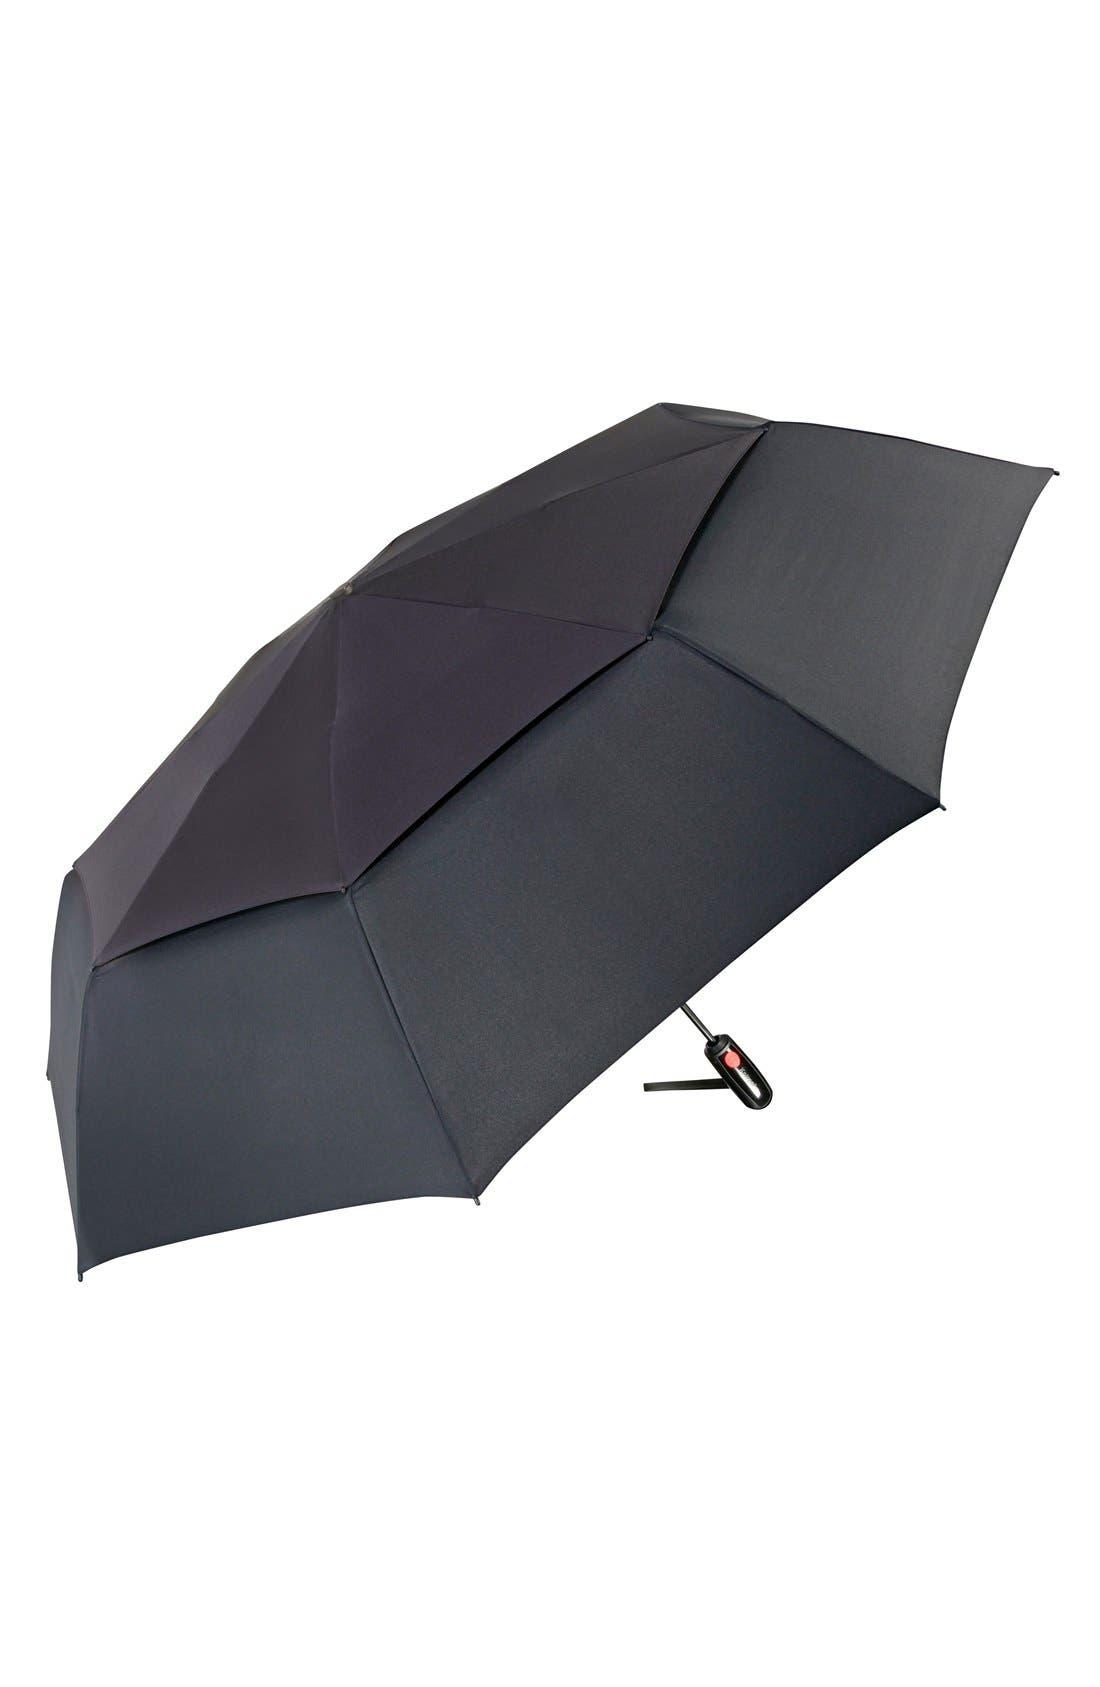 'Xtreme Duomatic' Umbrella,                         Main,                         color, BLACK